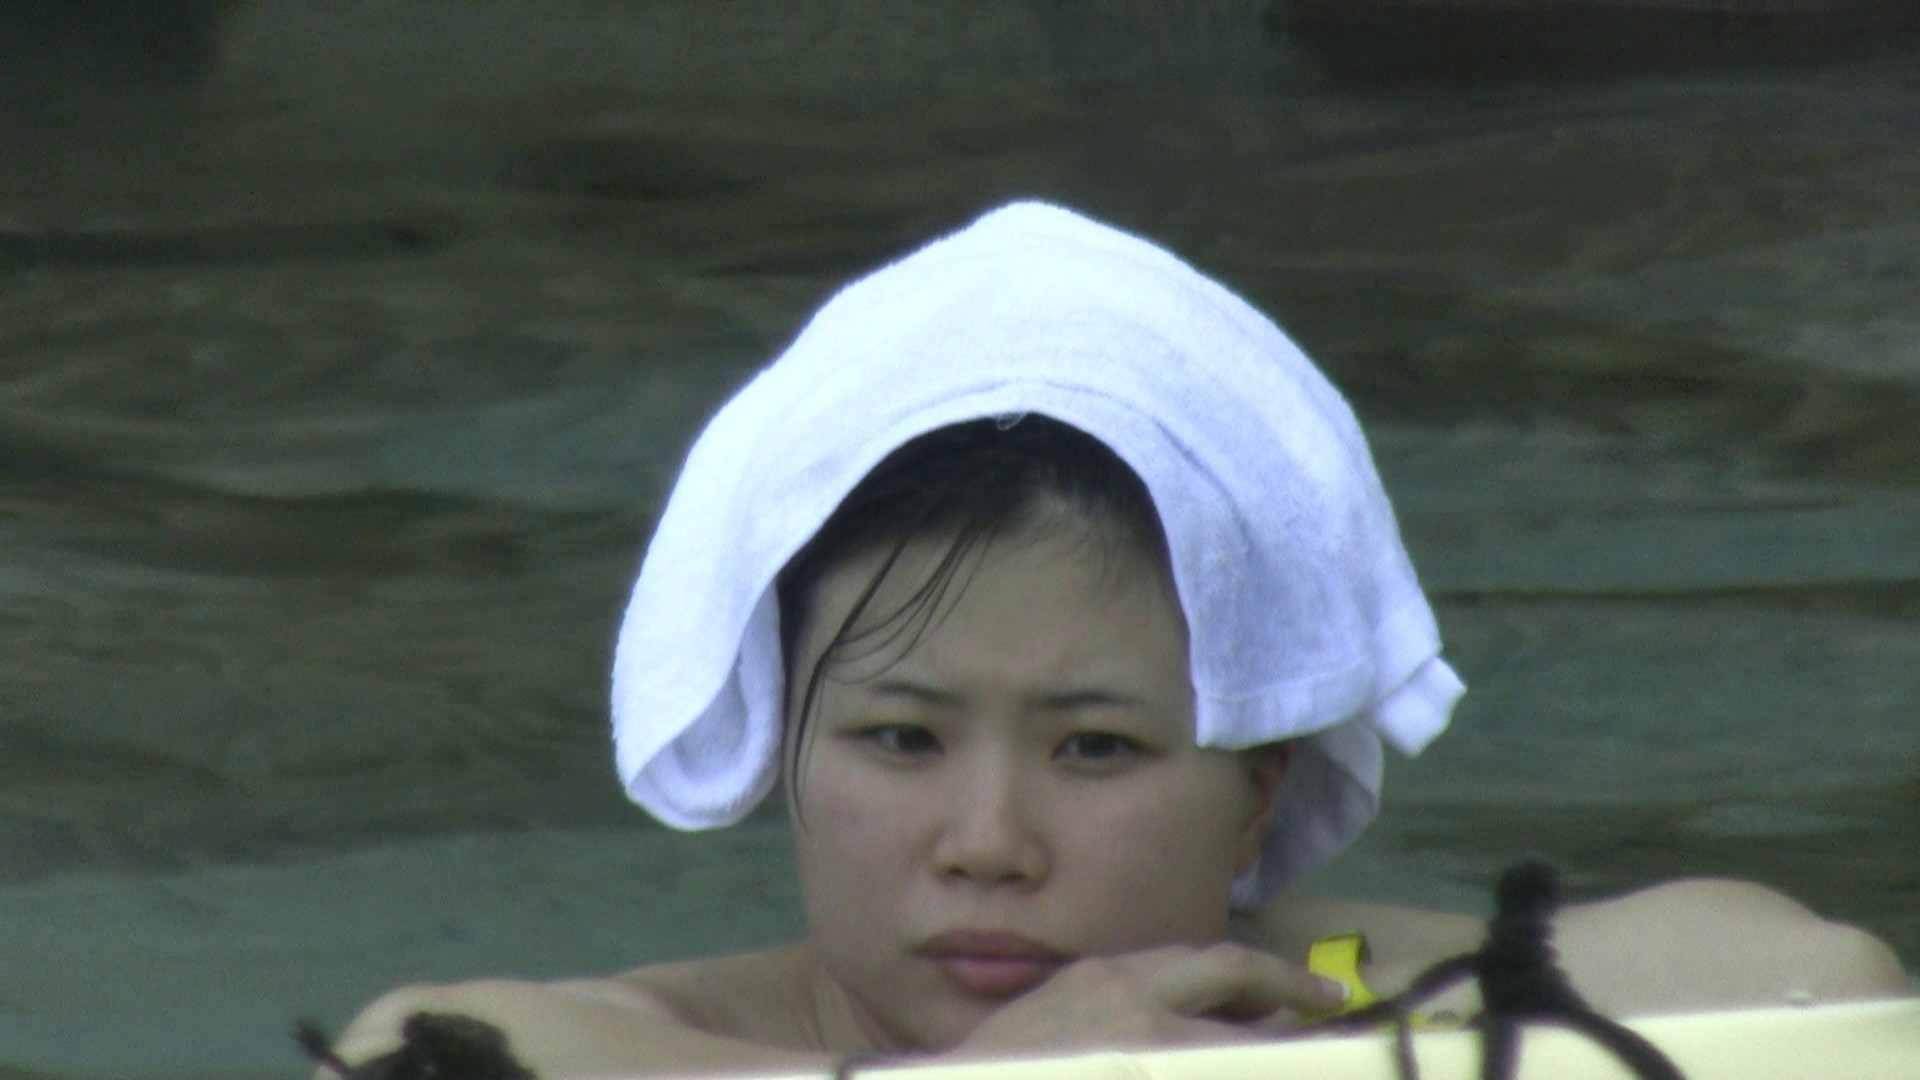 Aquaな露天風呂Vol.183 盗撮師作品 エロ無料画像 105pic 56